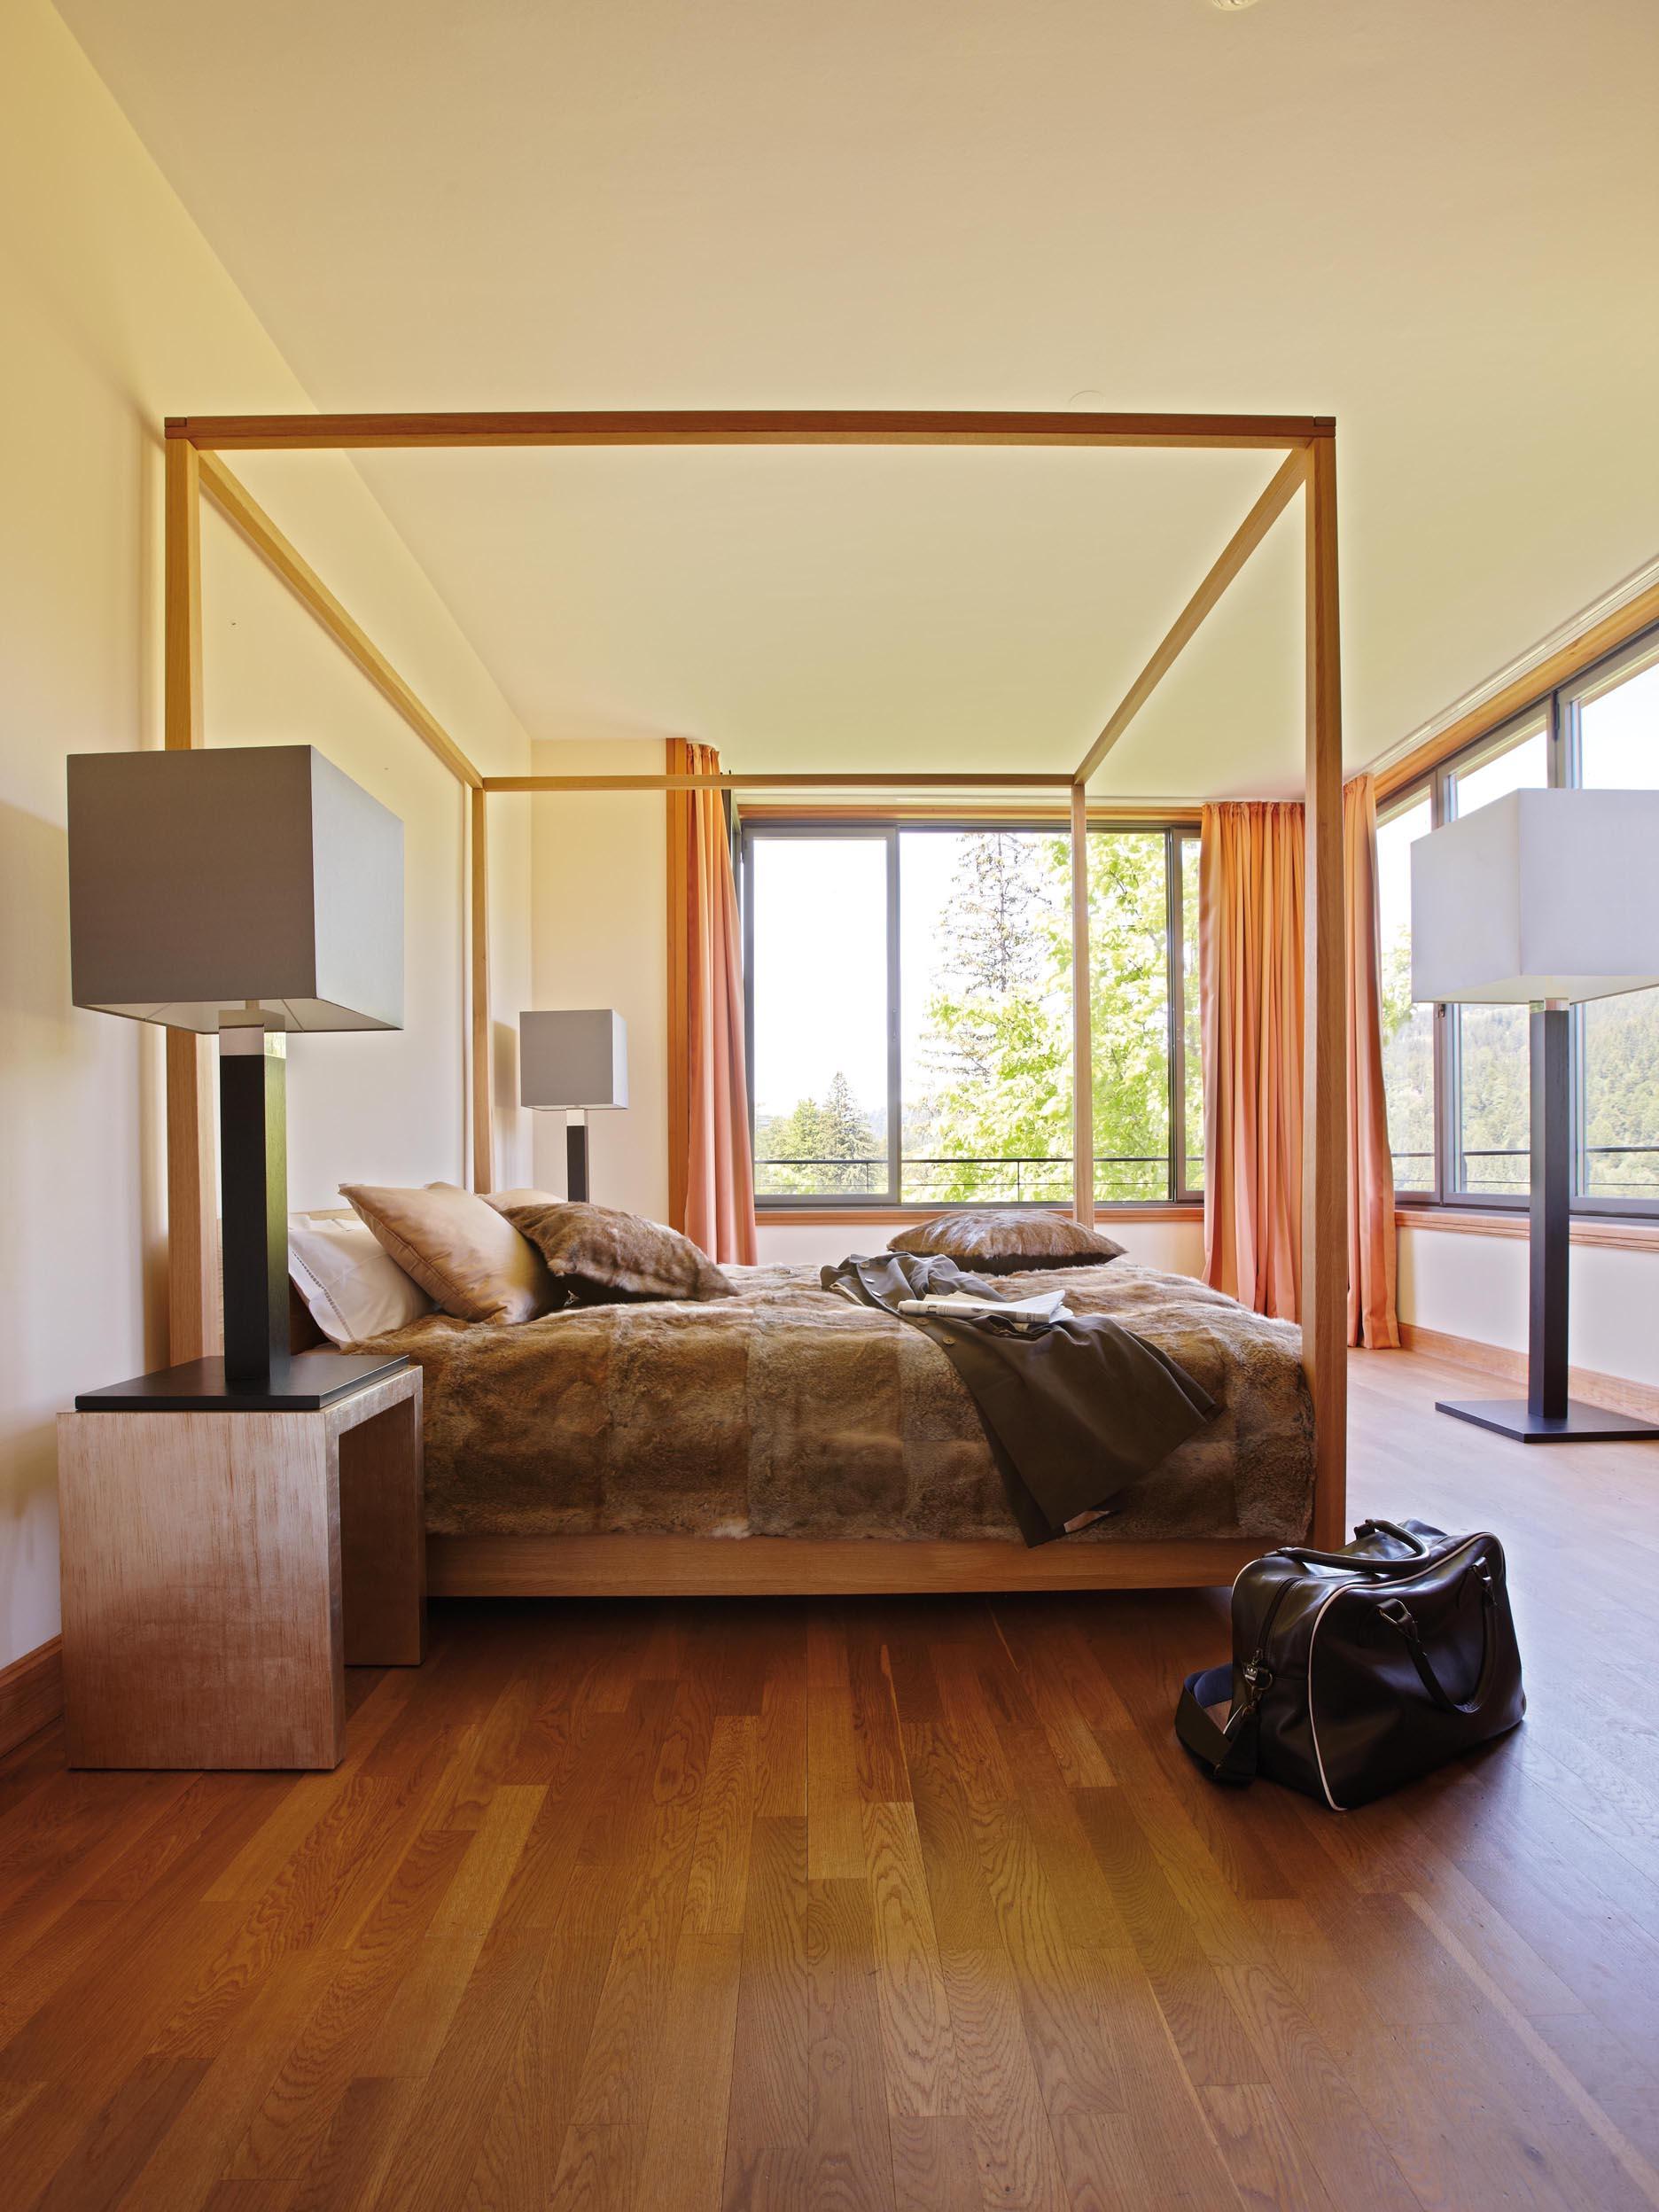 m bel ambiente raumausstattung. Black Bedroom Furniture Sets. Home Design Ideas